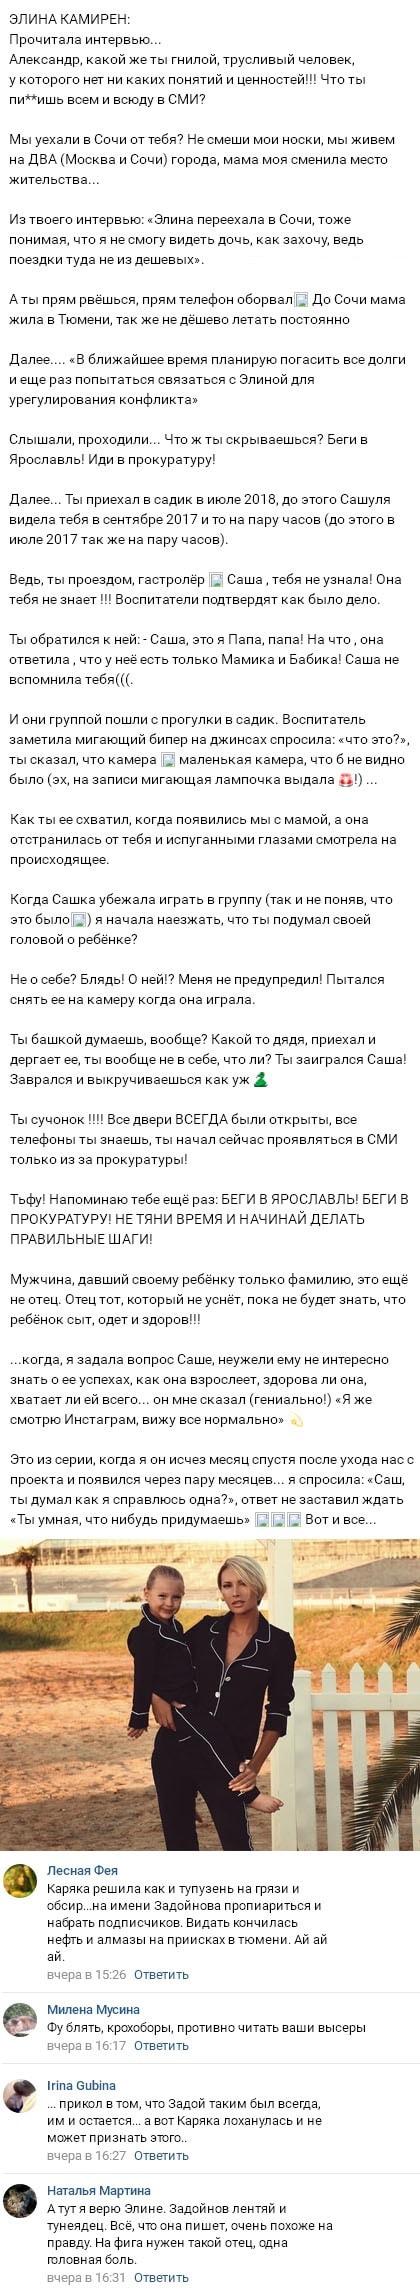 Элина Карякина в пух и прах разнесла Александра Задойнова